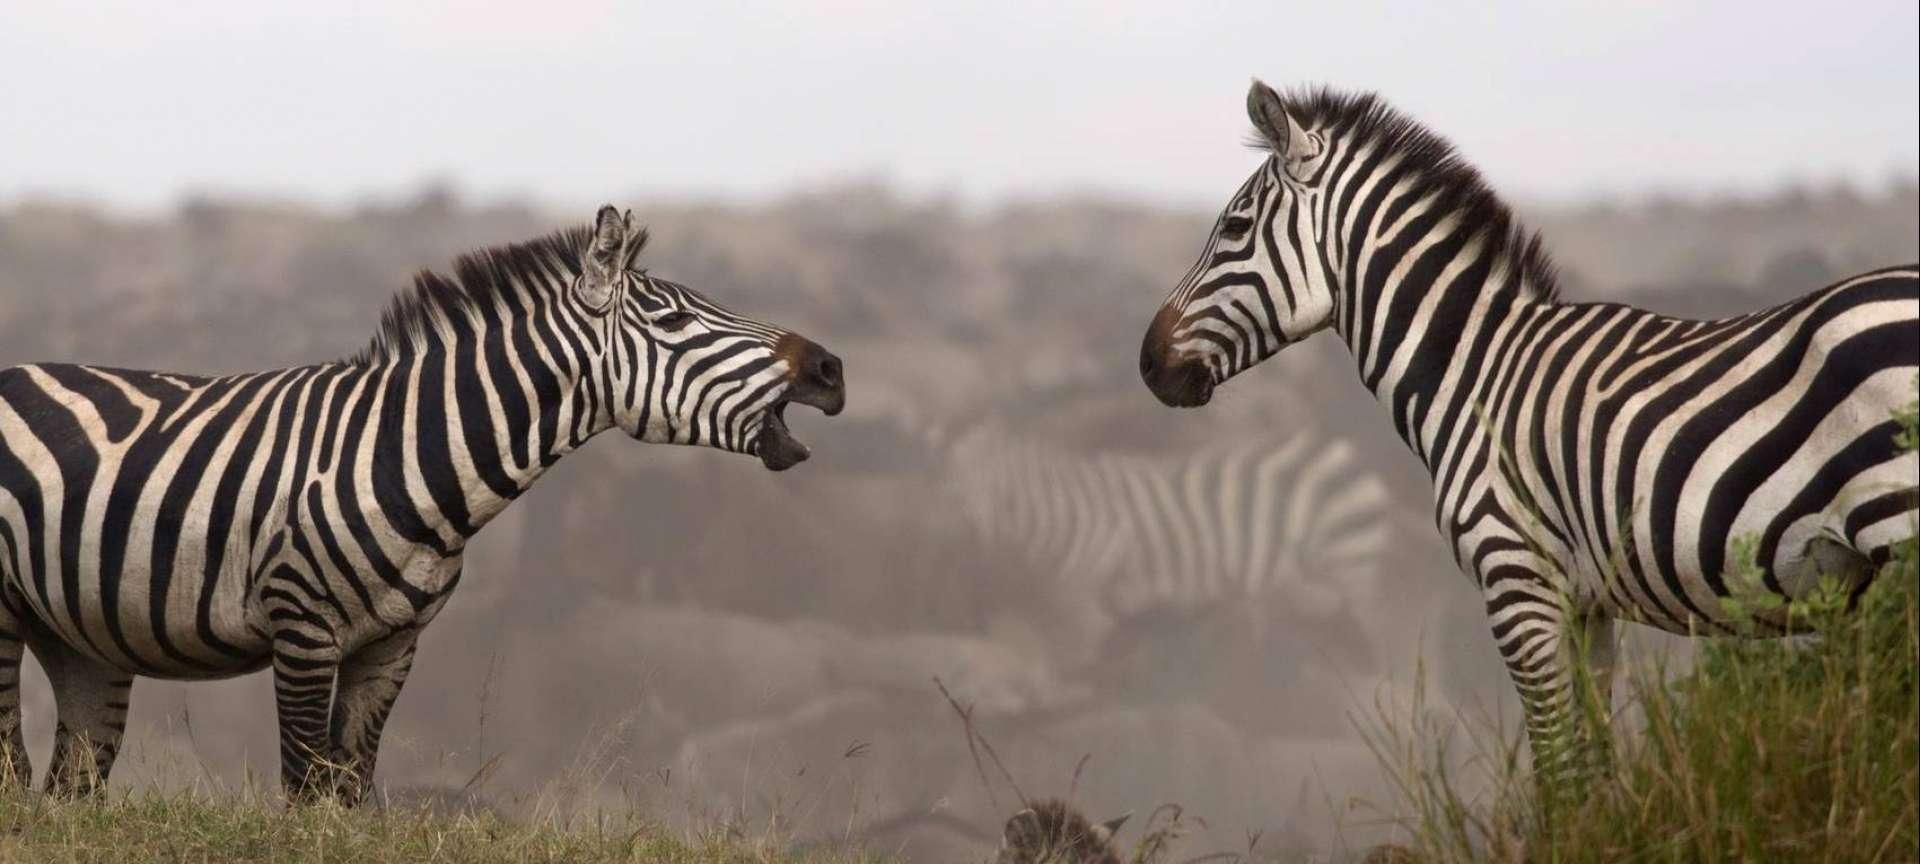 Tanzania Northern Circuit - Africa Wildlife Safaris